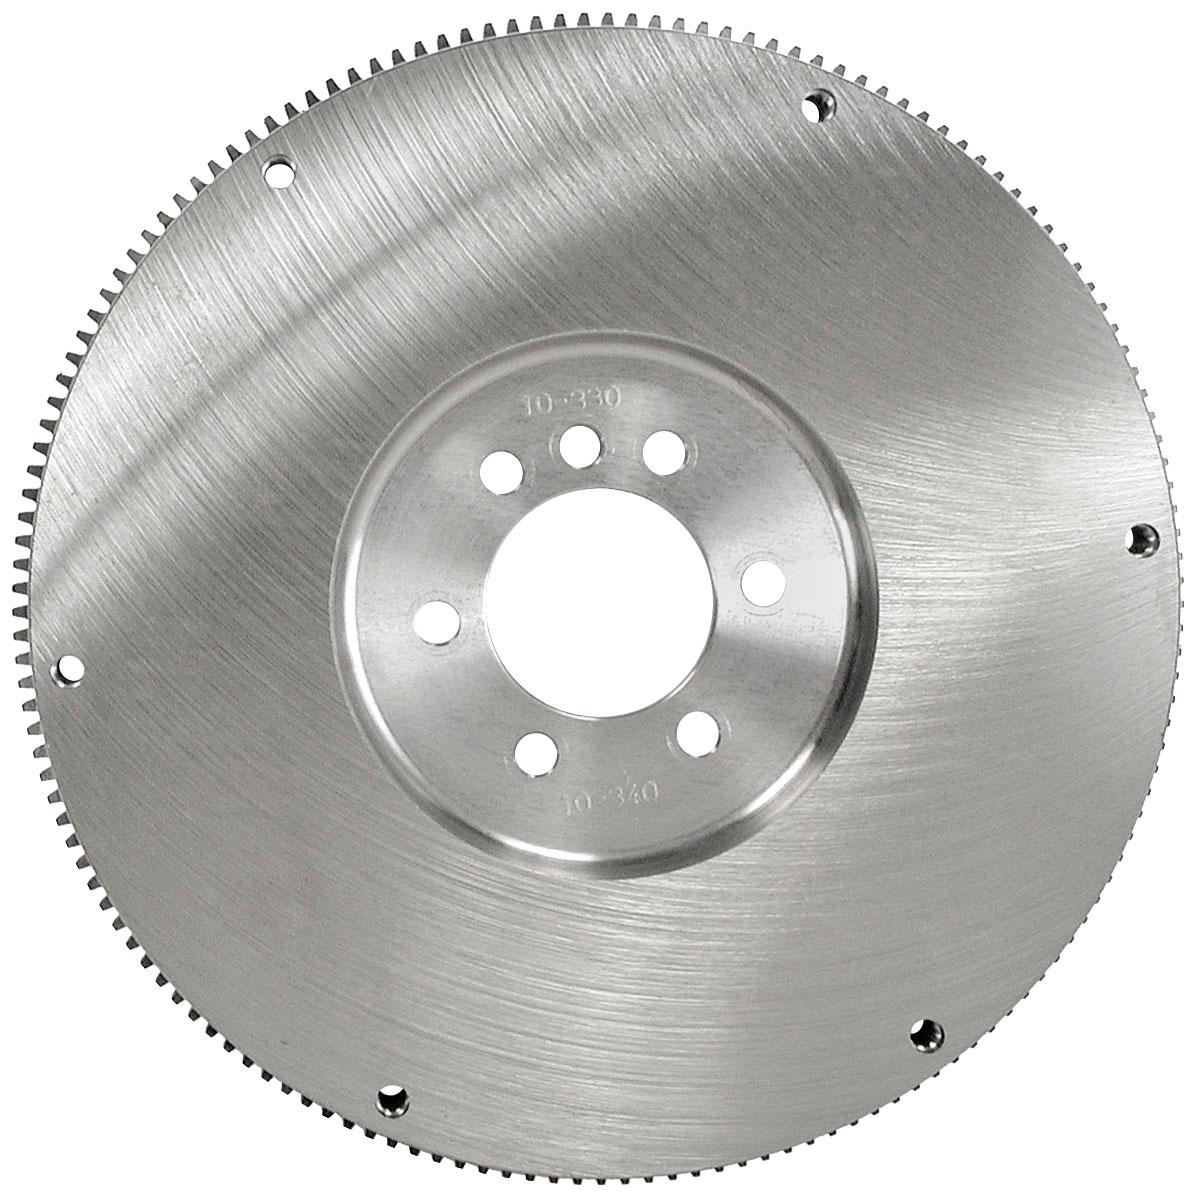 Flywheel, Hays, Chevrolet V8, Internal Balanced, 30LB., 153 Tooth